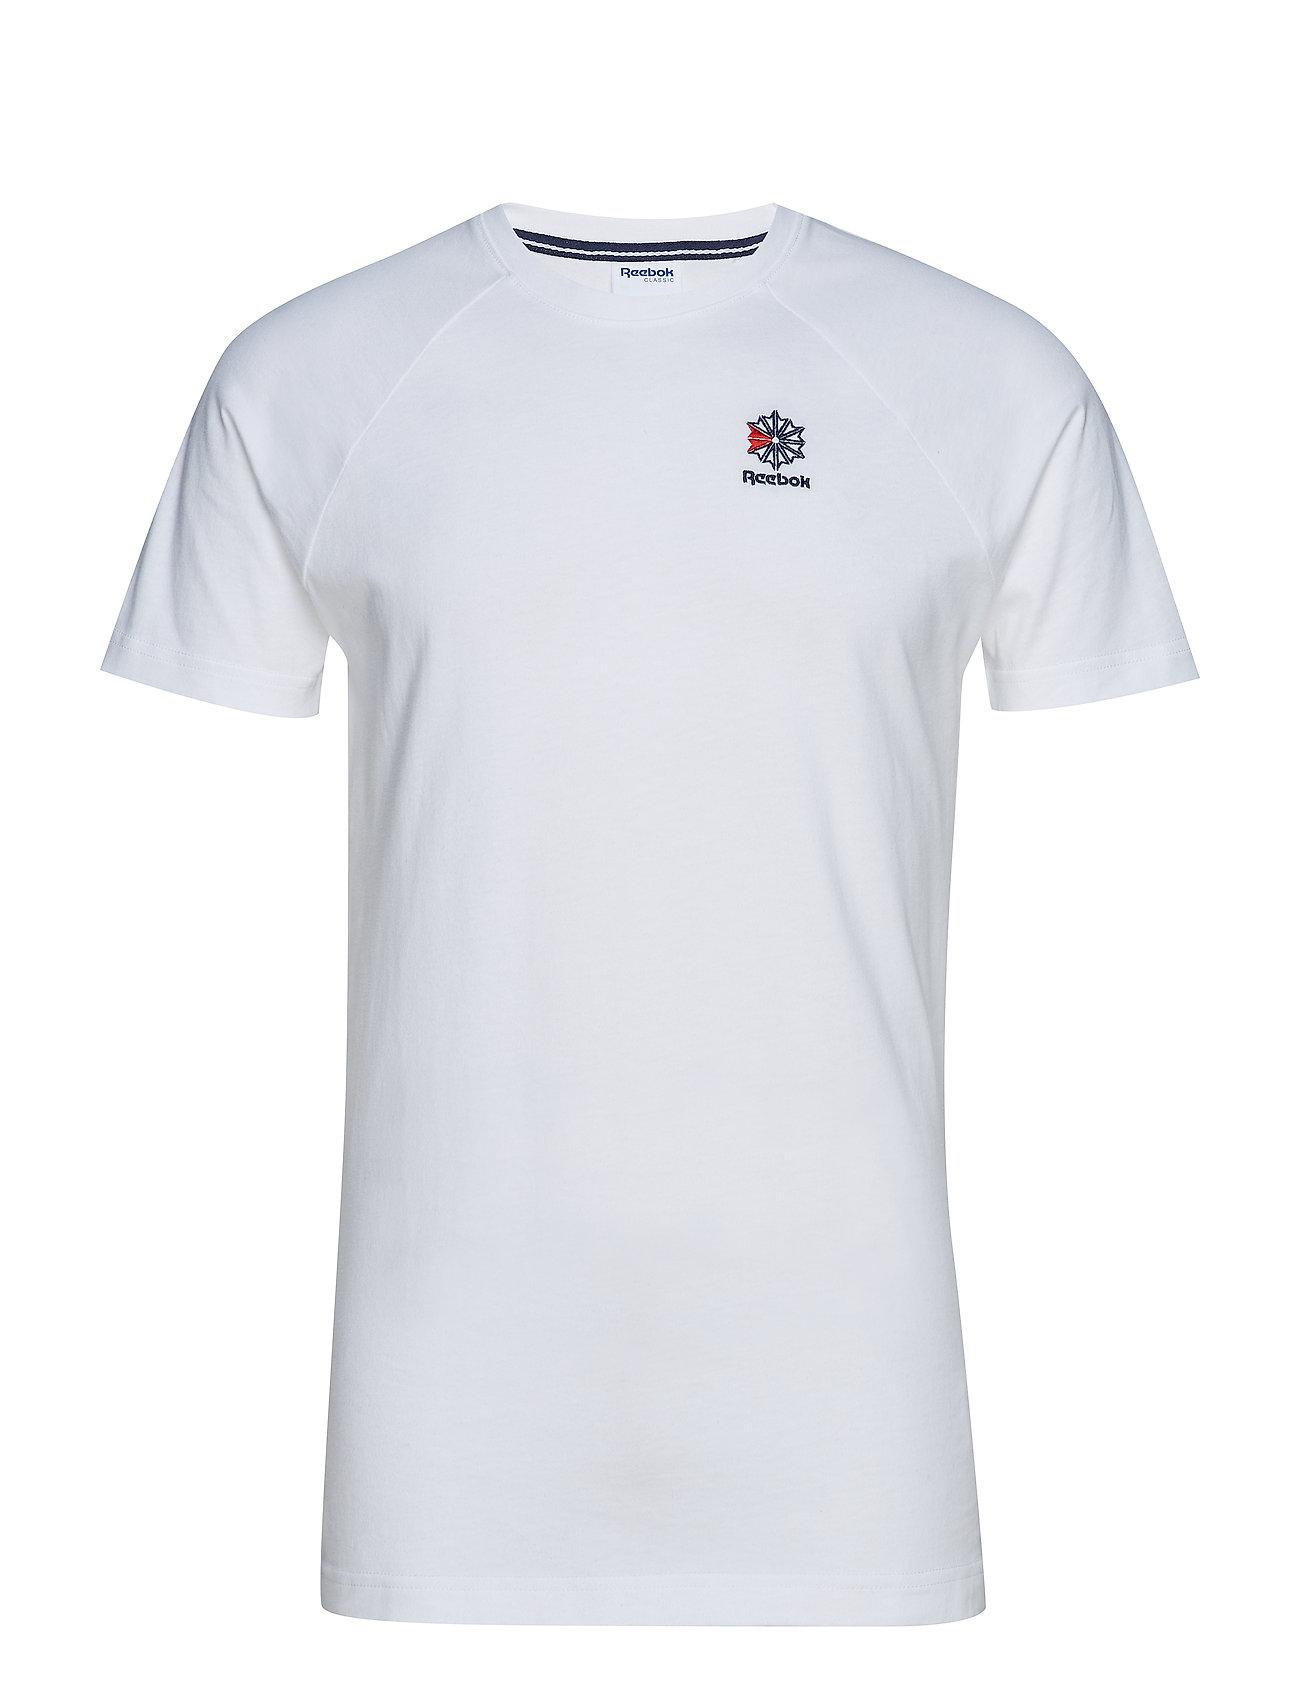 c59a4269 Ac F Ss Longer Tee (White) (249 kr) - Reebok Classics - T-shirts ...